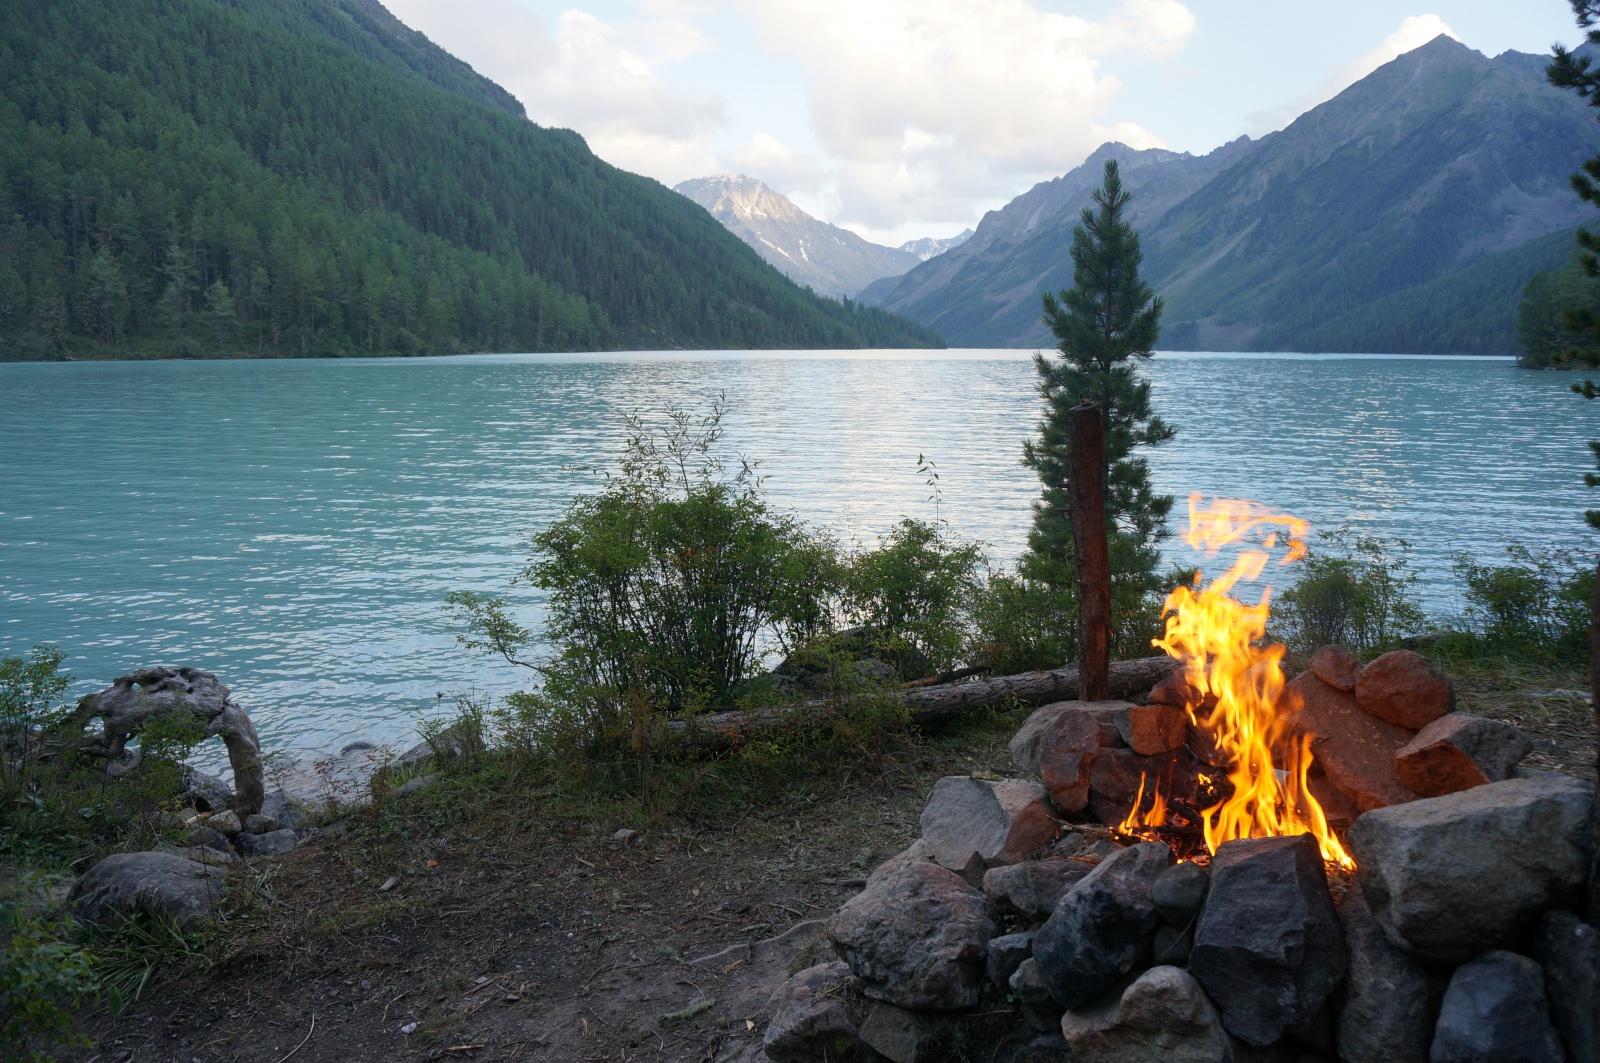 Вечерний костер на берегу Кучерлинского озера на Алтае